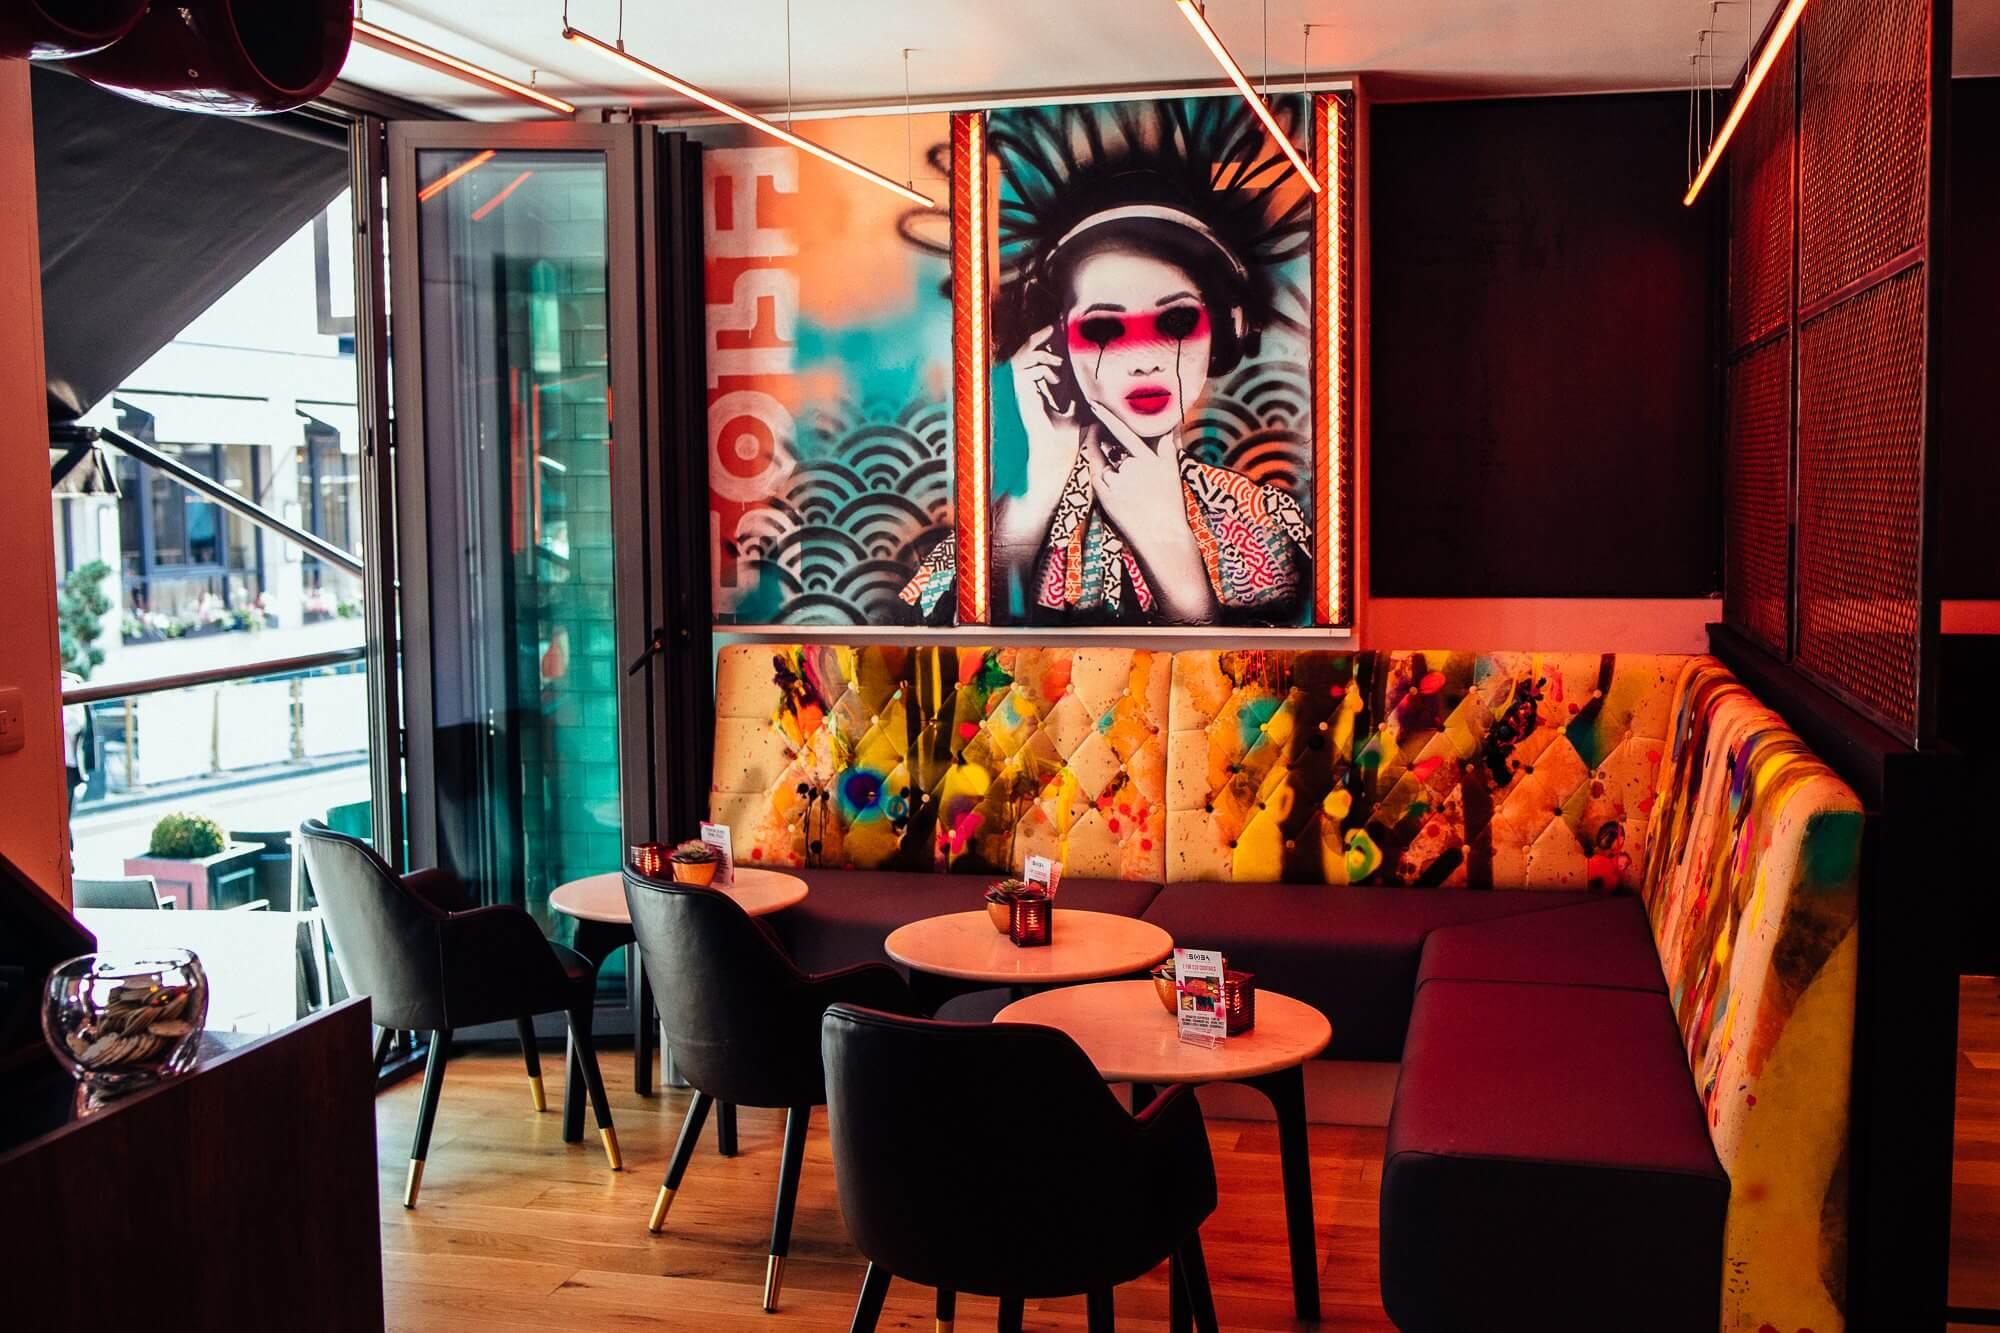 Bar Soba|Bar Soba Cocktails|Bar Soba Glasgow Burger|